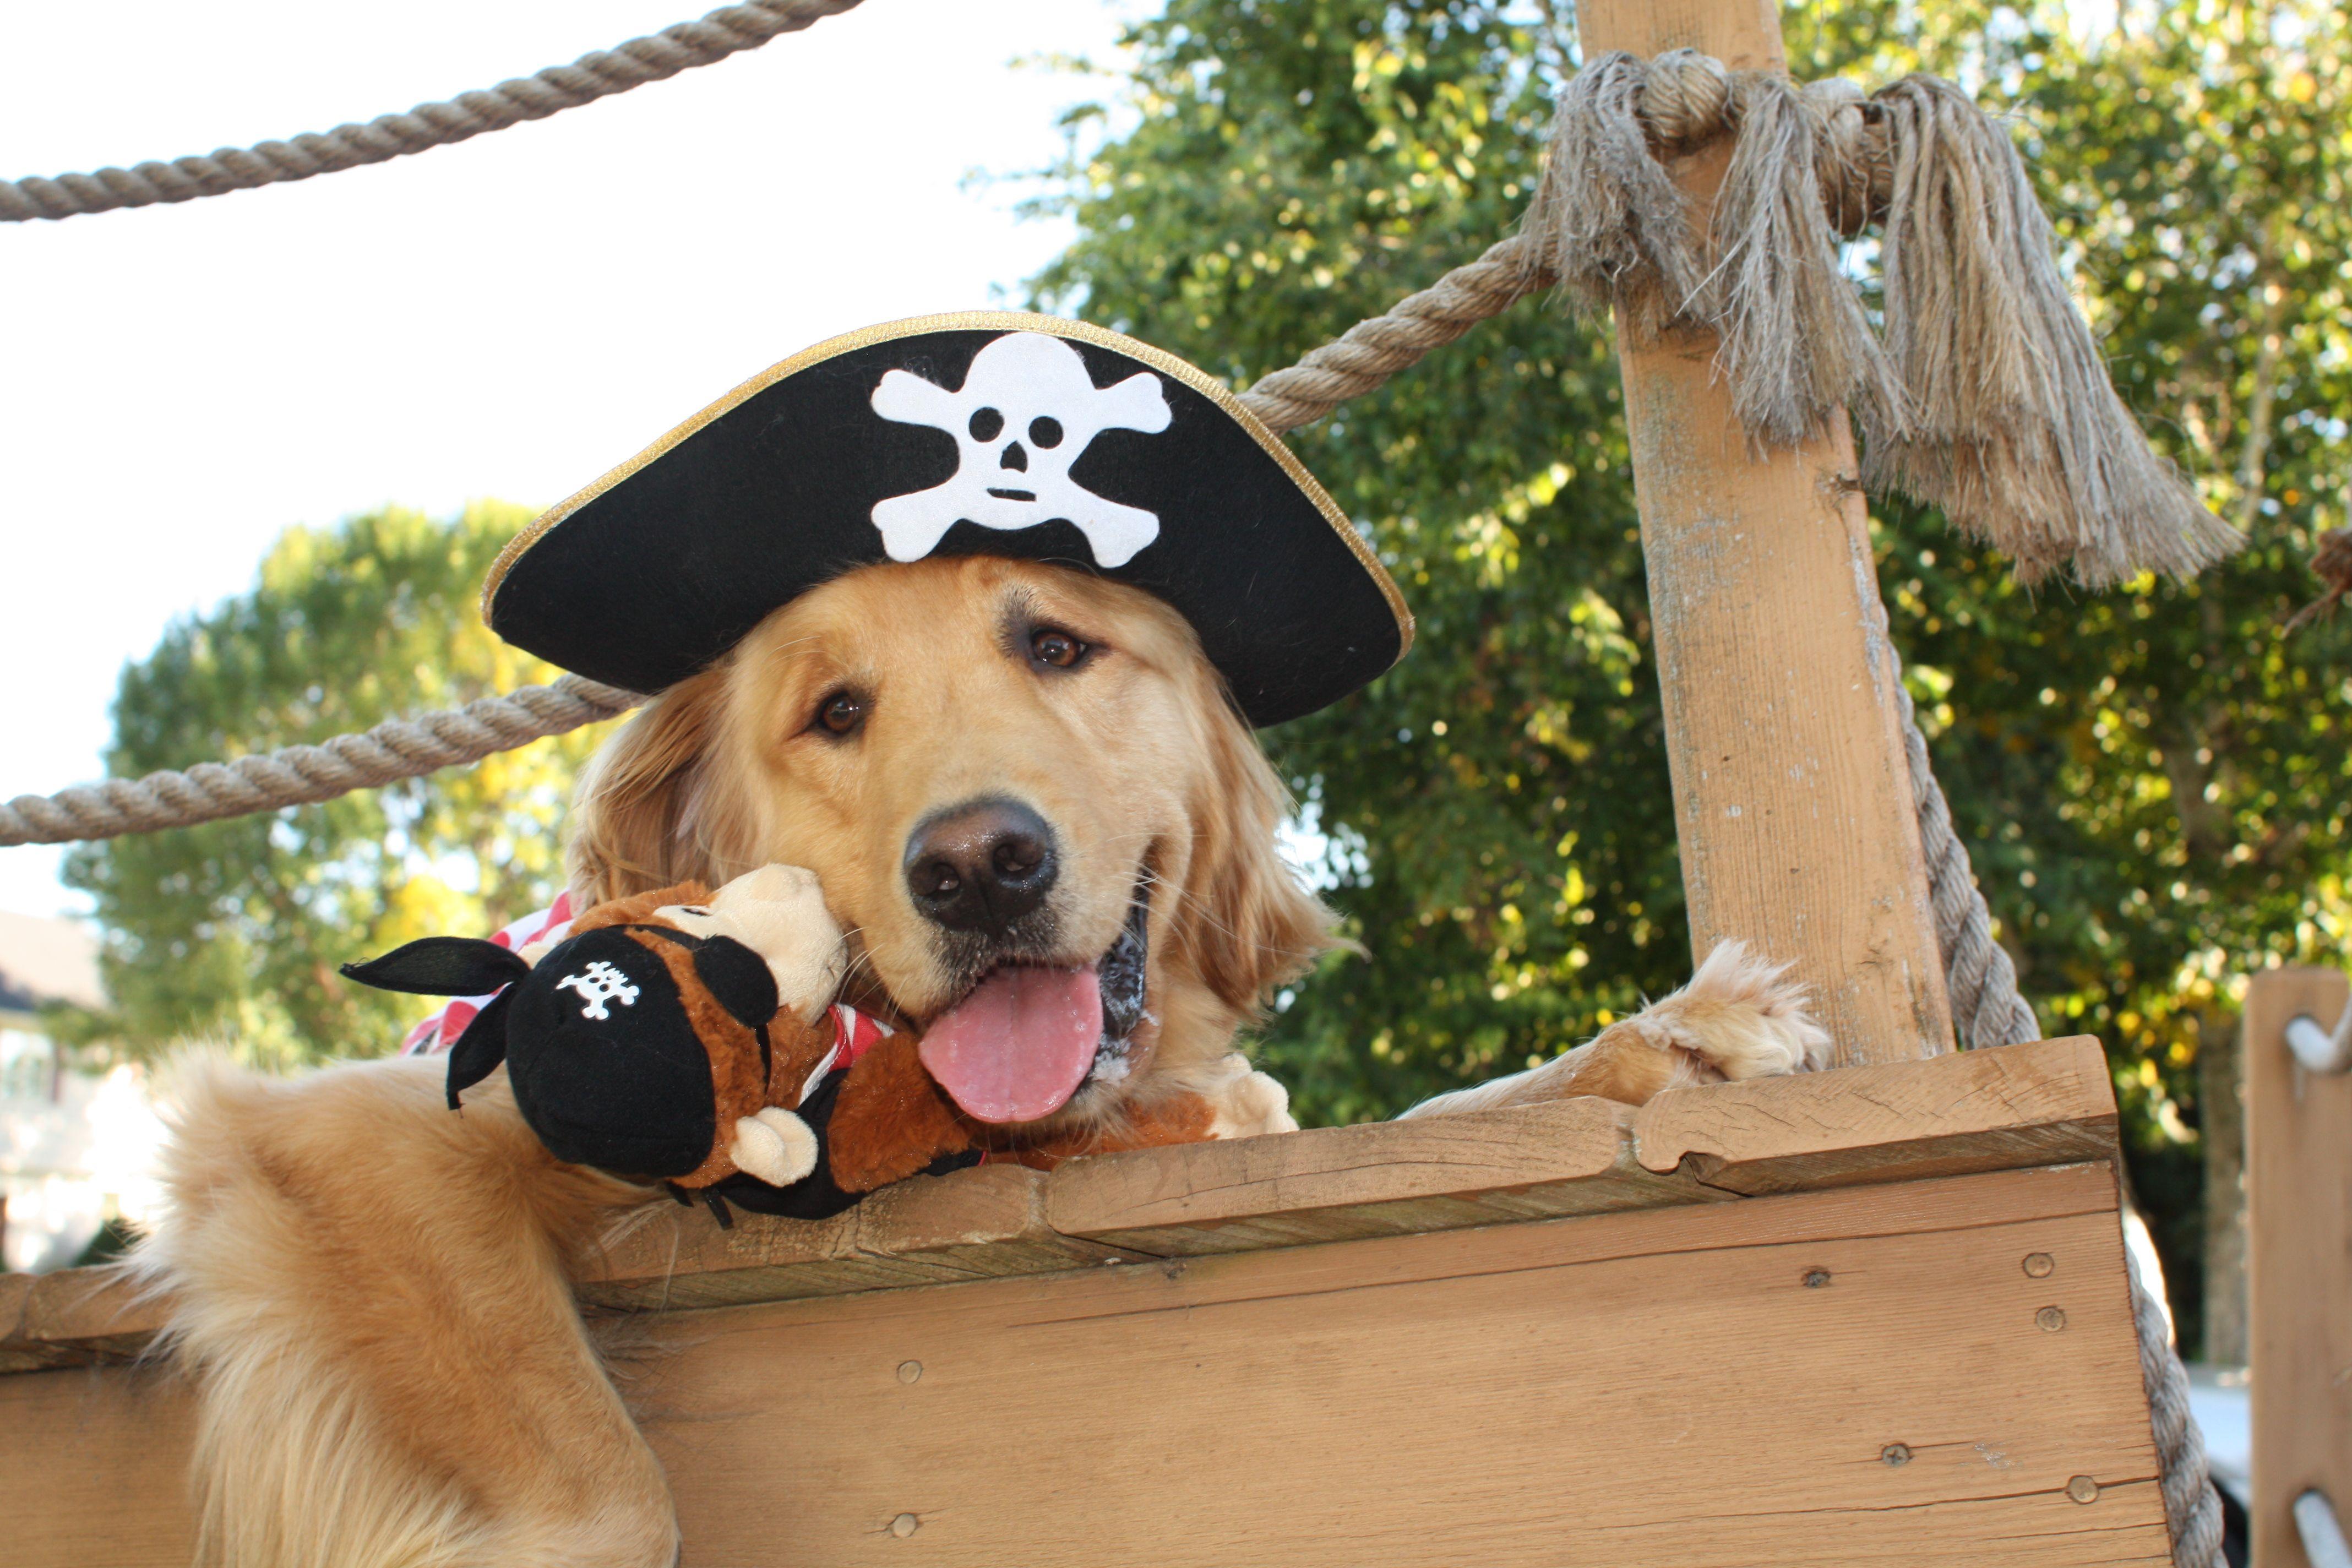 Pin By Jennifer Elizabeth On Just Finn A Golden Crazy Dog Lady Dog Lovers Golden Retriever